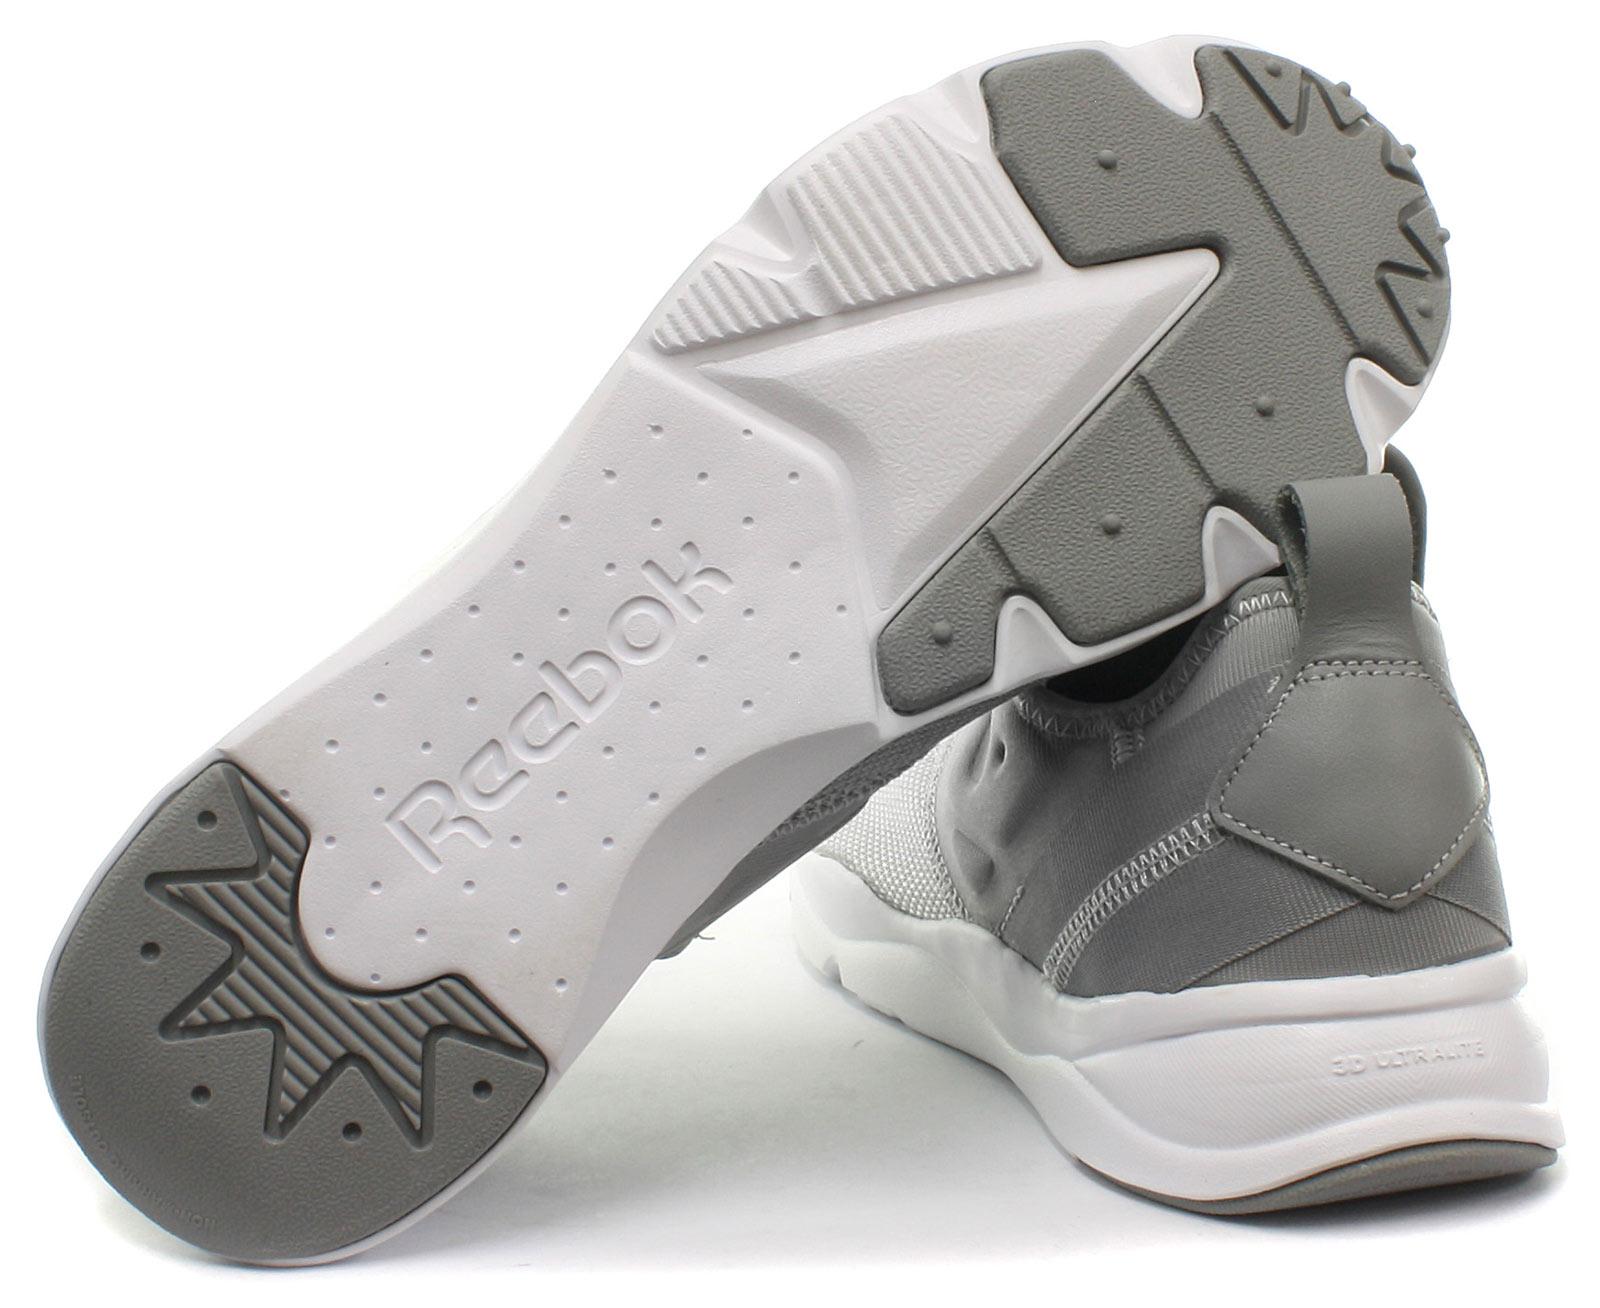 Reebok Classic Furylite Slip Contemporary Damenschuhe Trainers ALL SIZES